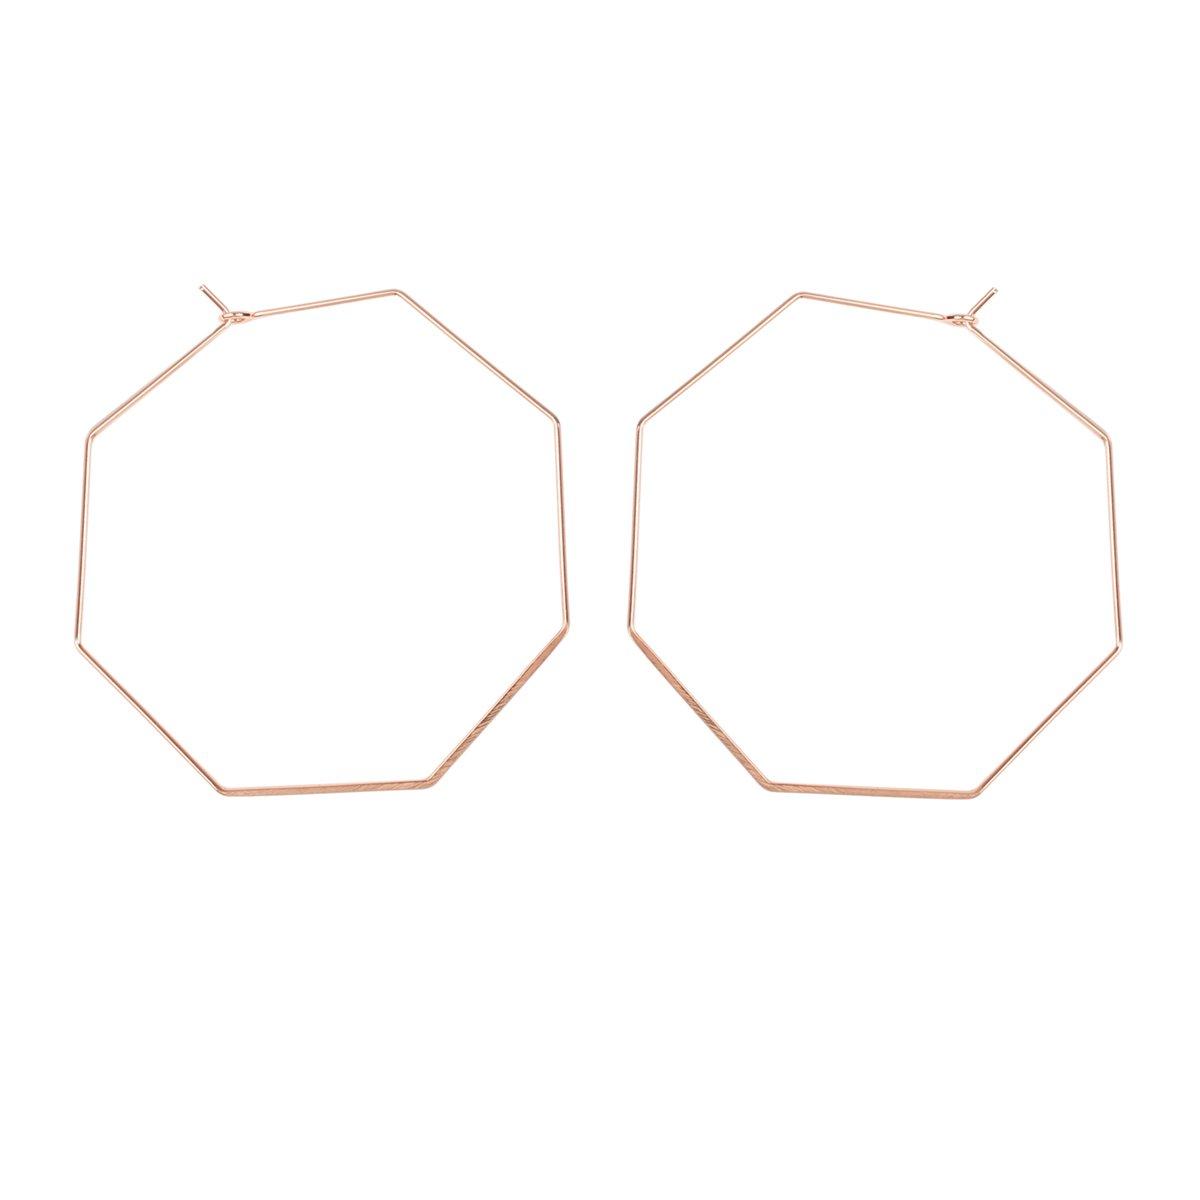 RIAH FASHION Lightweight Geometric Hoop Earrings - Classic Brass Wire Threader Dangles (Octagon Rose Gold)